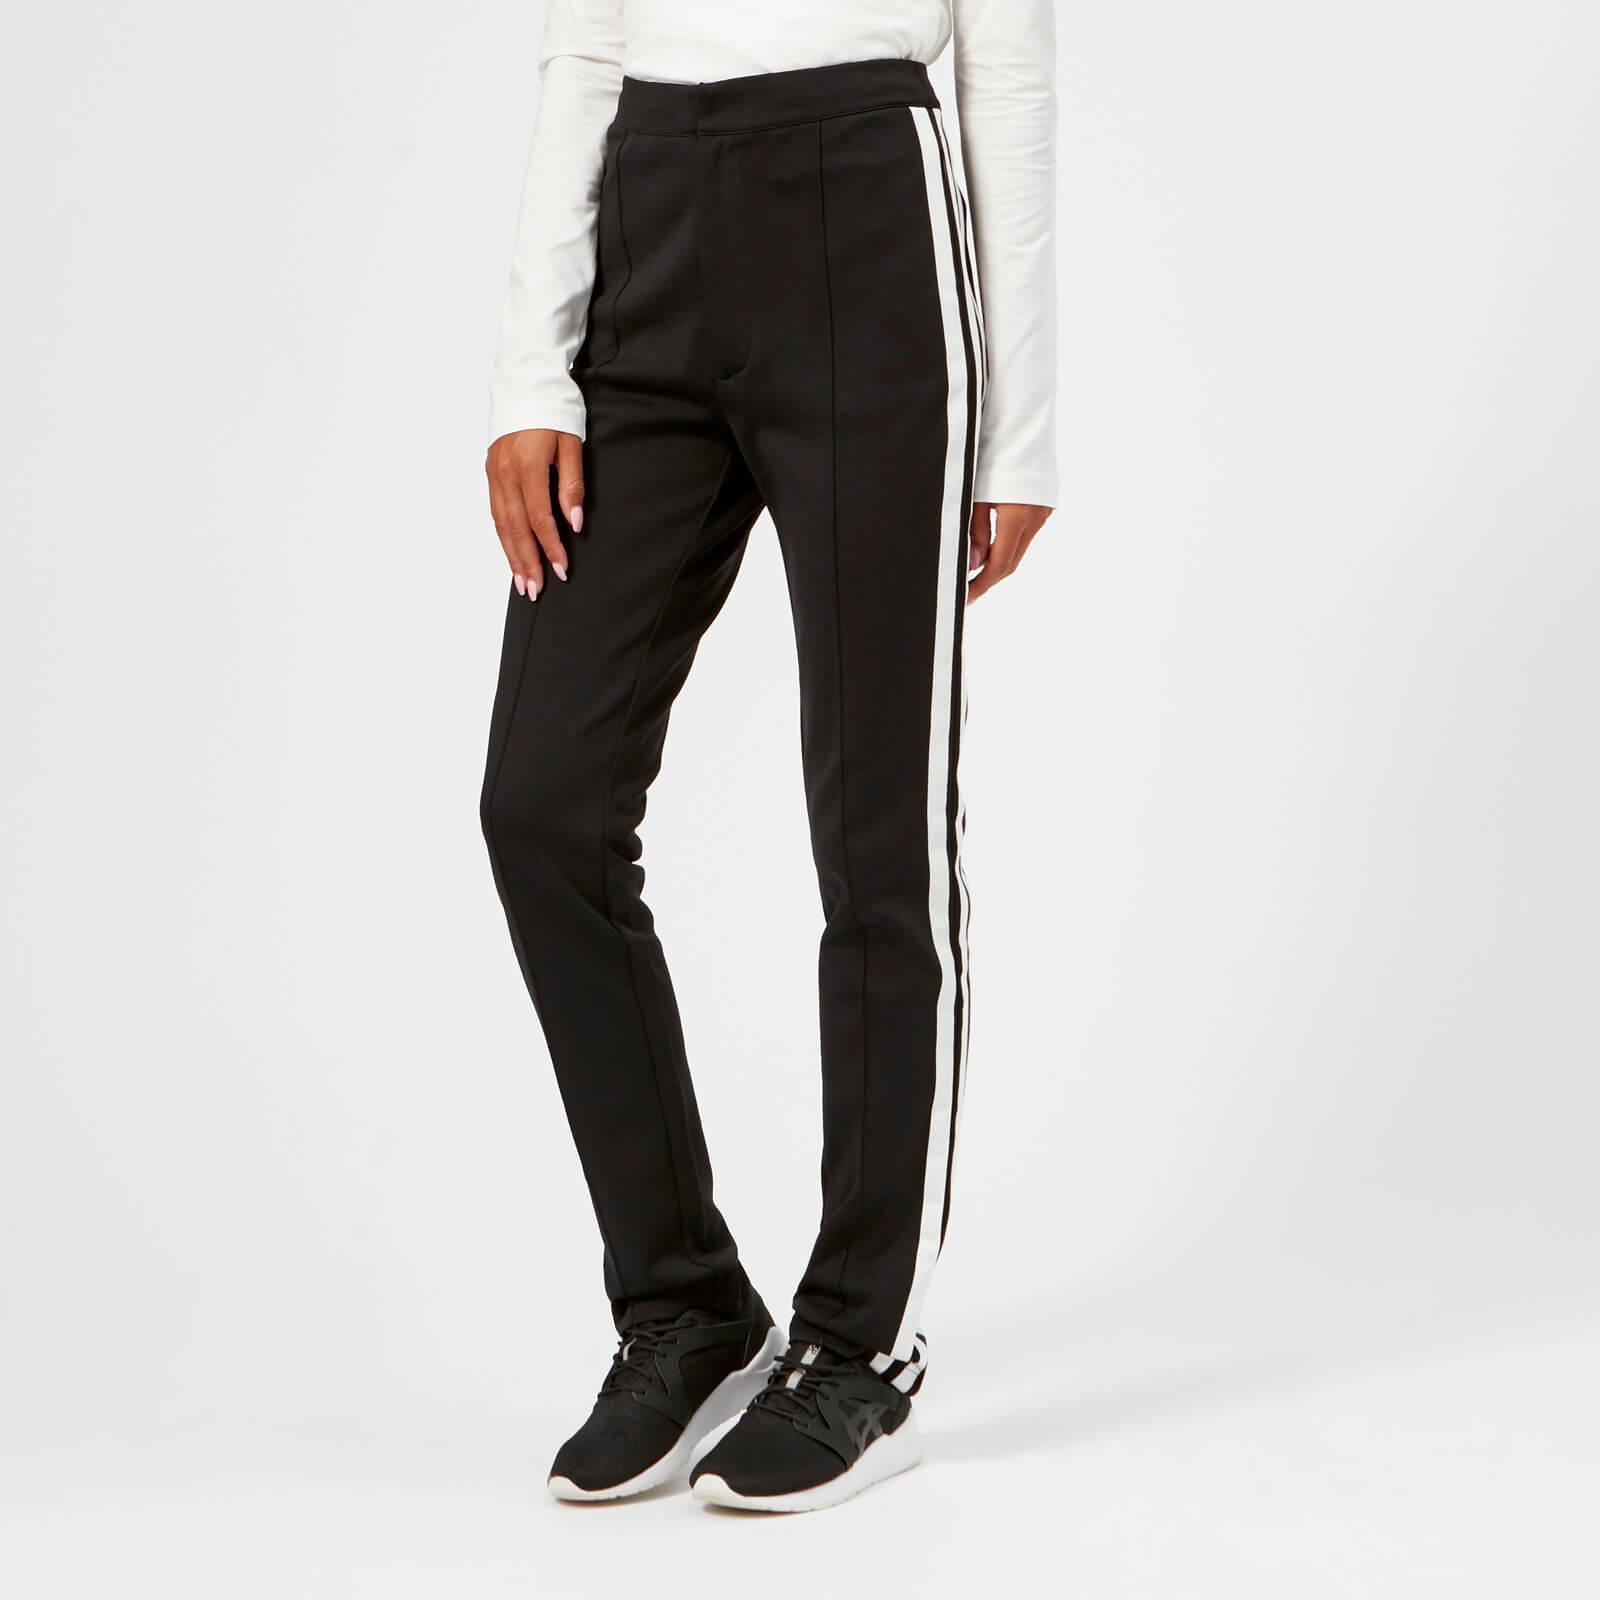 9f026d1cd4b9c Y-3 - Black Matt Track High Waist Pants - Lyst. View fullscreen